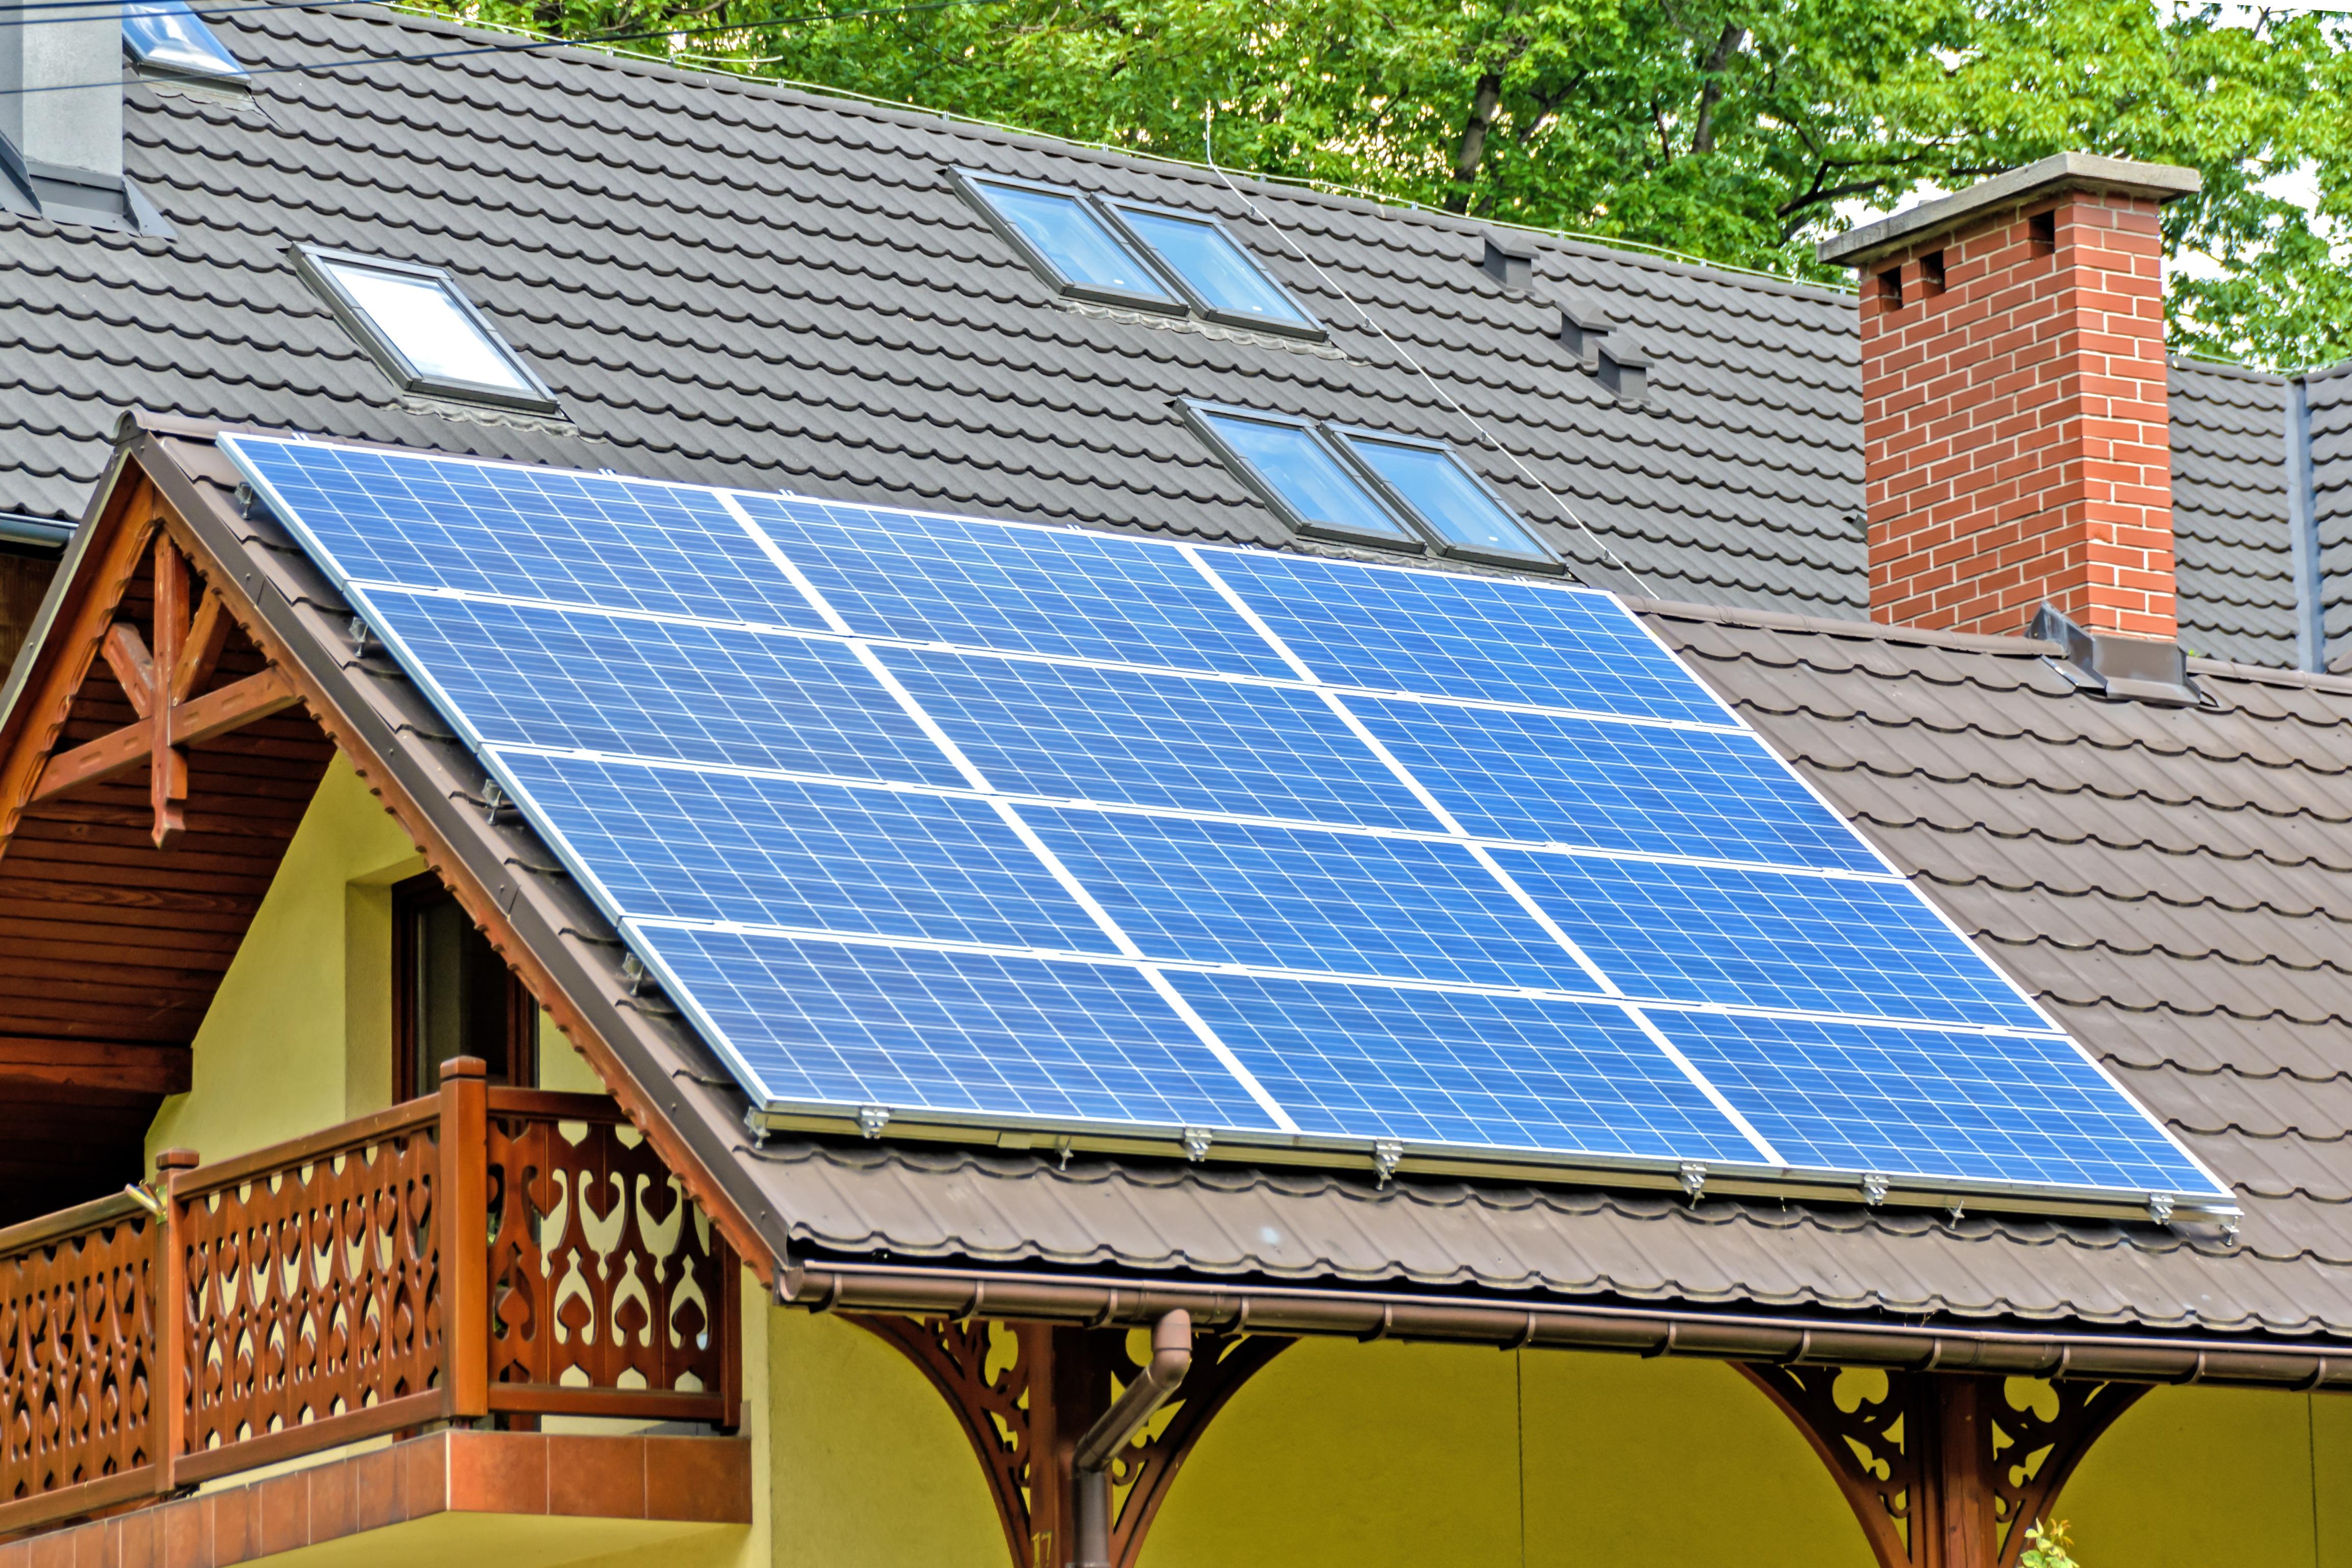 solar panels, heating, renewable energy